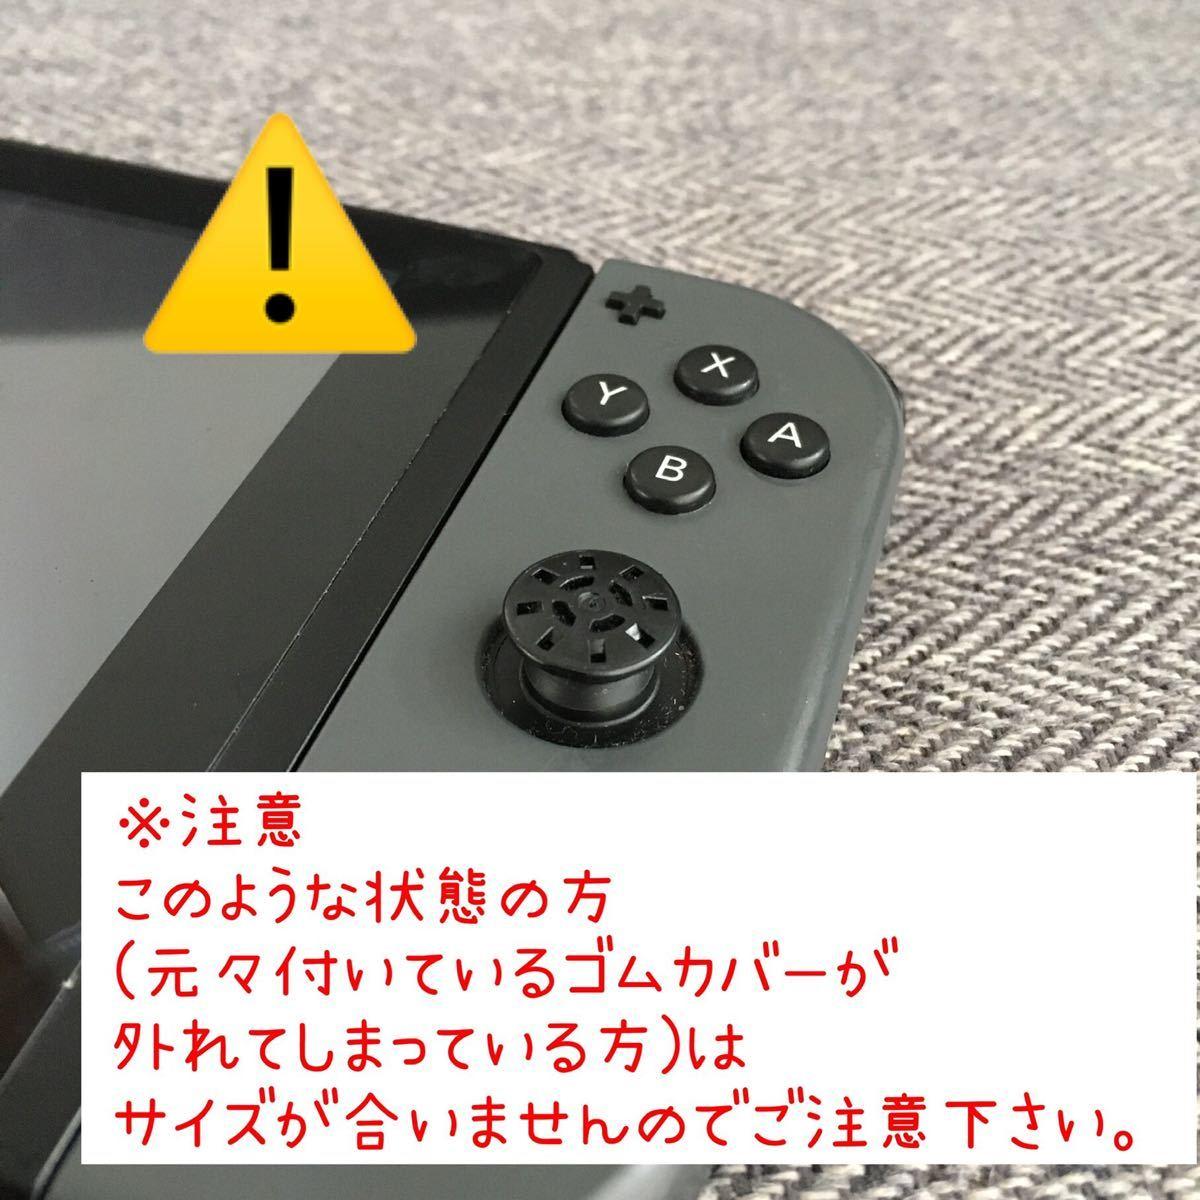 Switch スイッチ ジョイコン スティックカバー 肉球 2個【ピンク白】